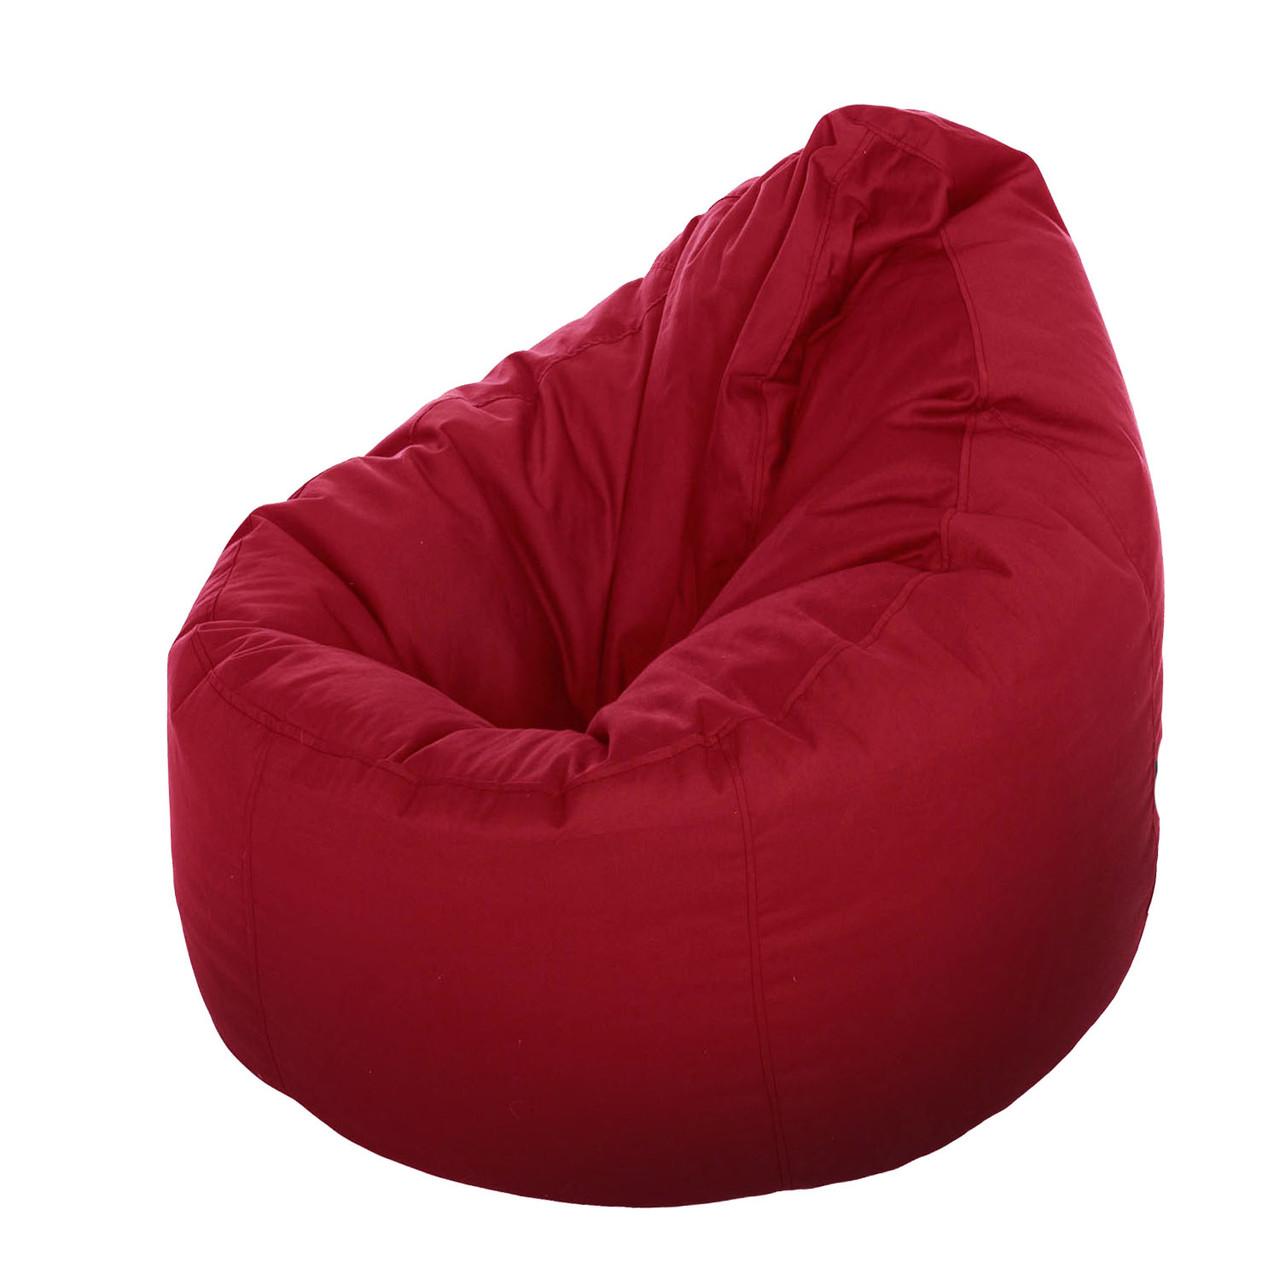 Bean bag (Кресло-мешок) Груша XL красное